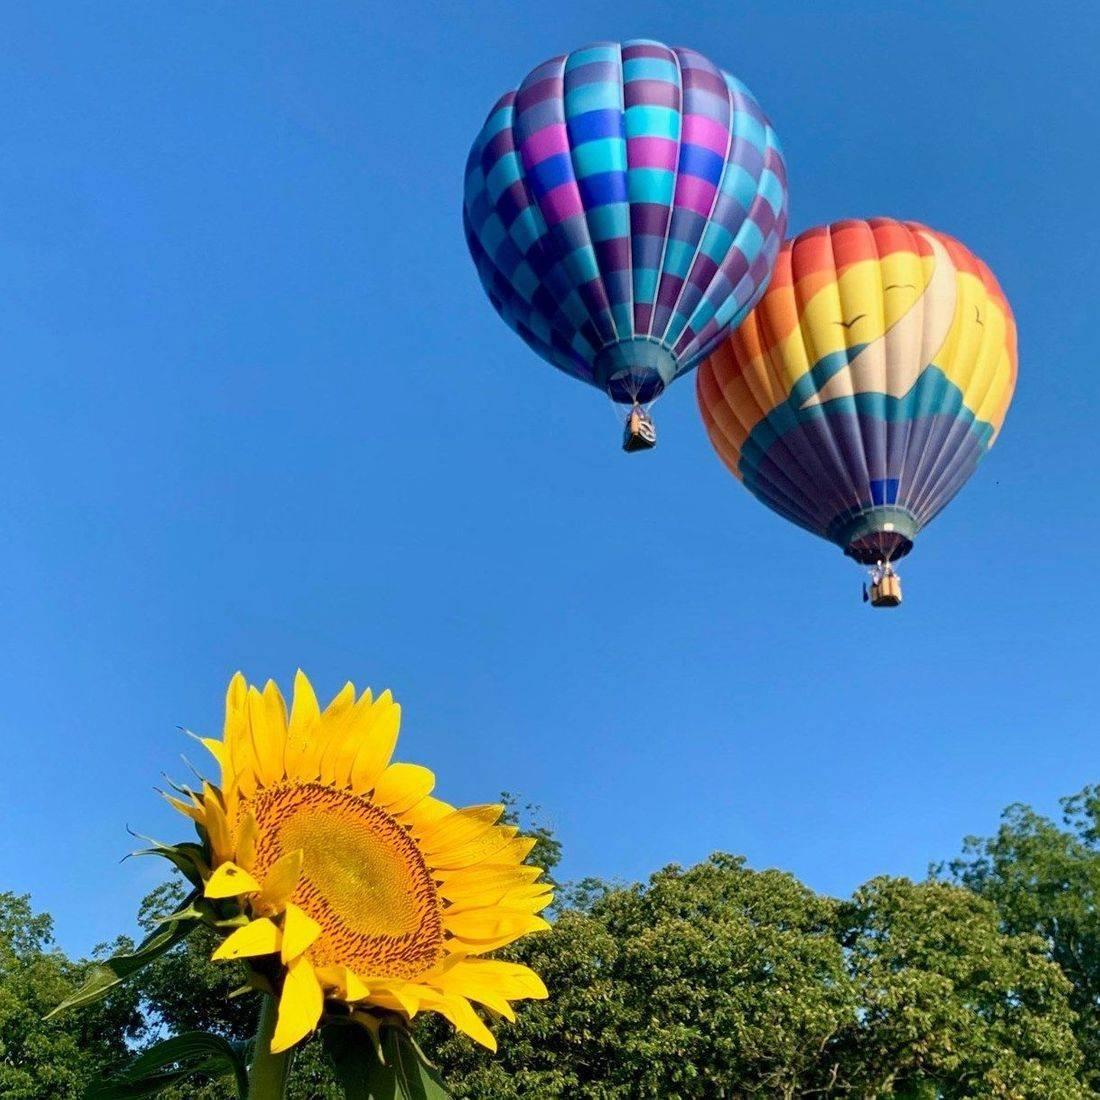 Smoky Mtn Air Balloon Rides